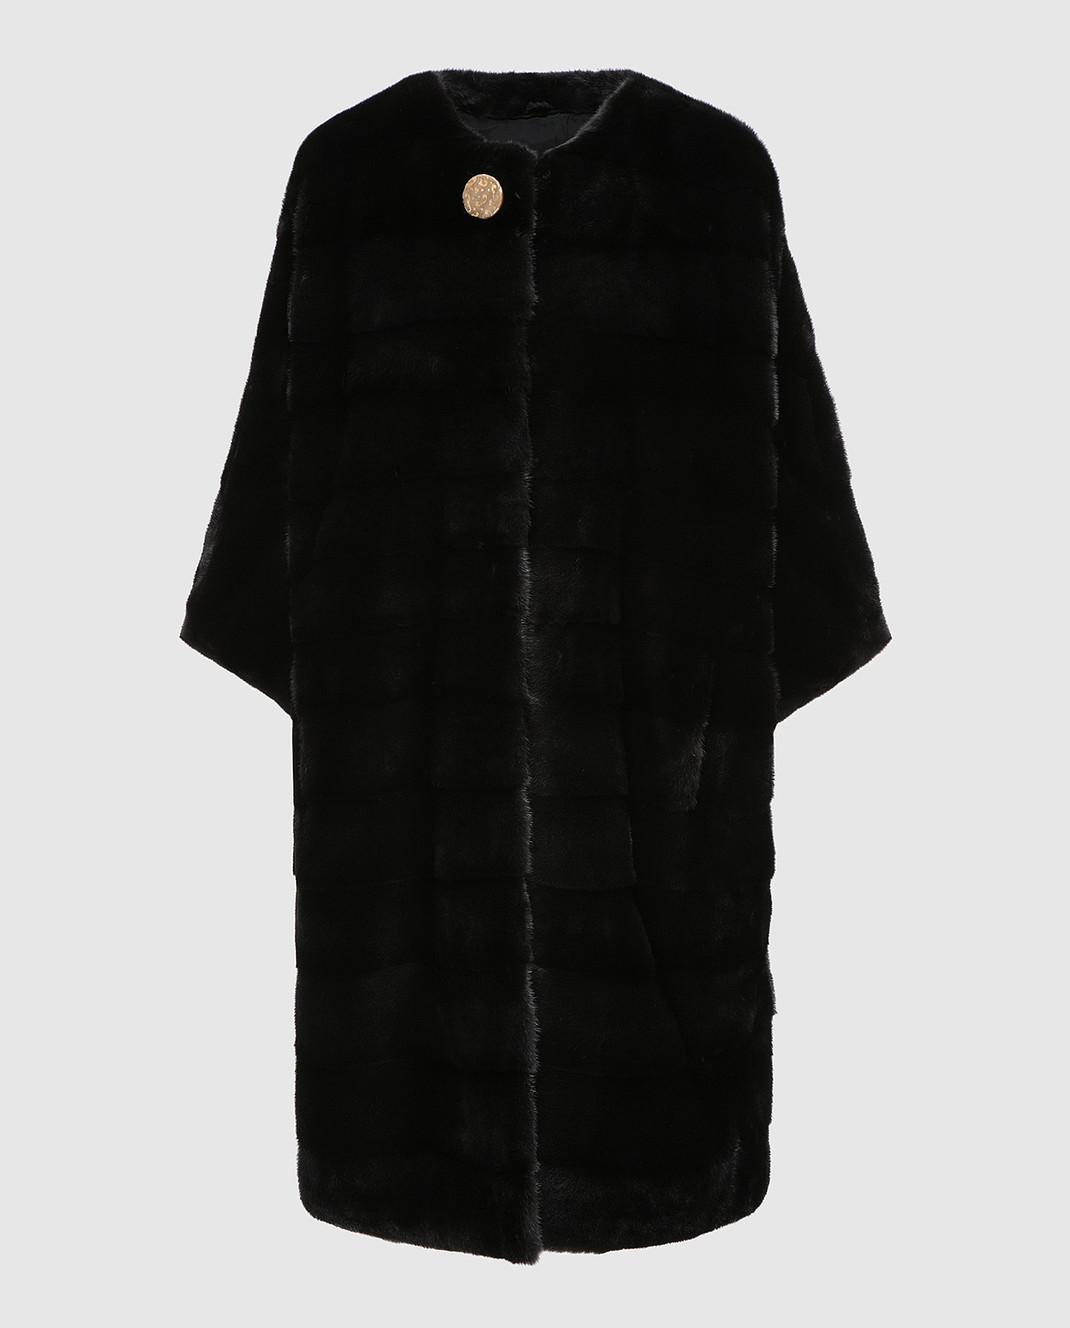 Real Furs House Черное меховое пальто TB923